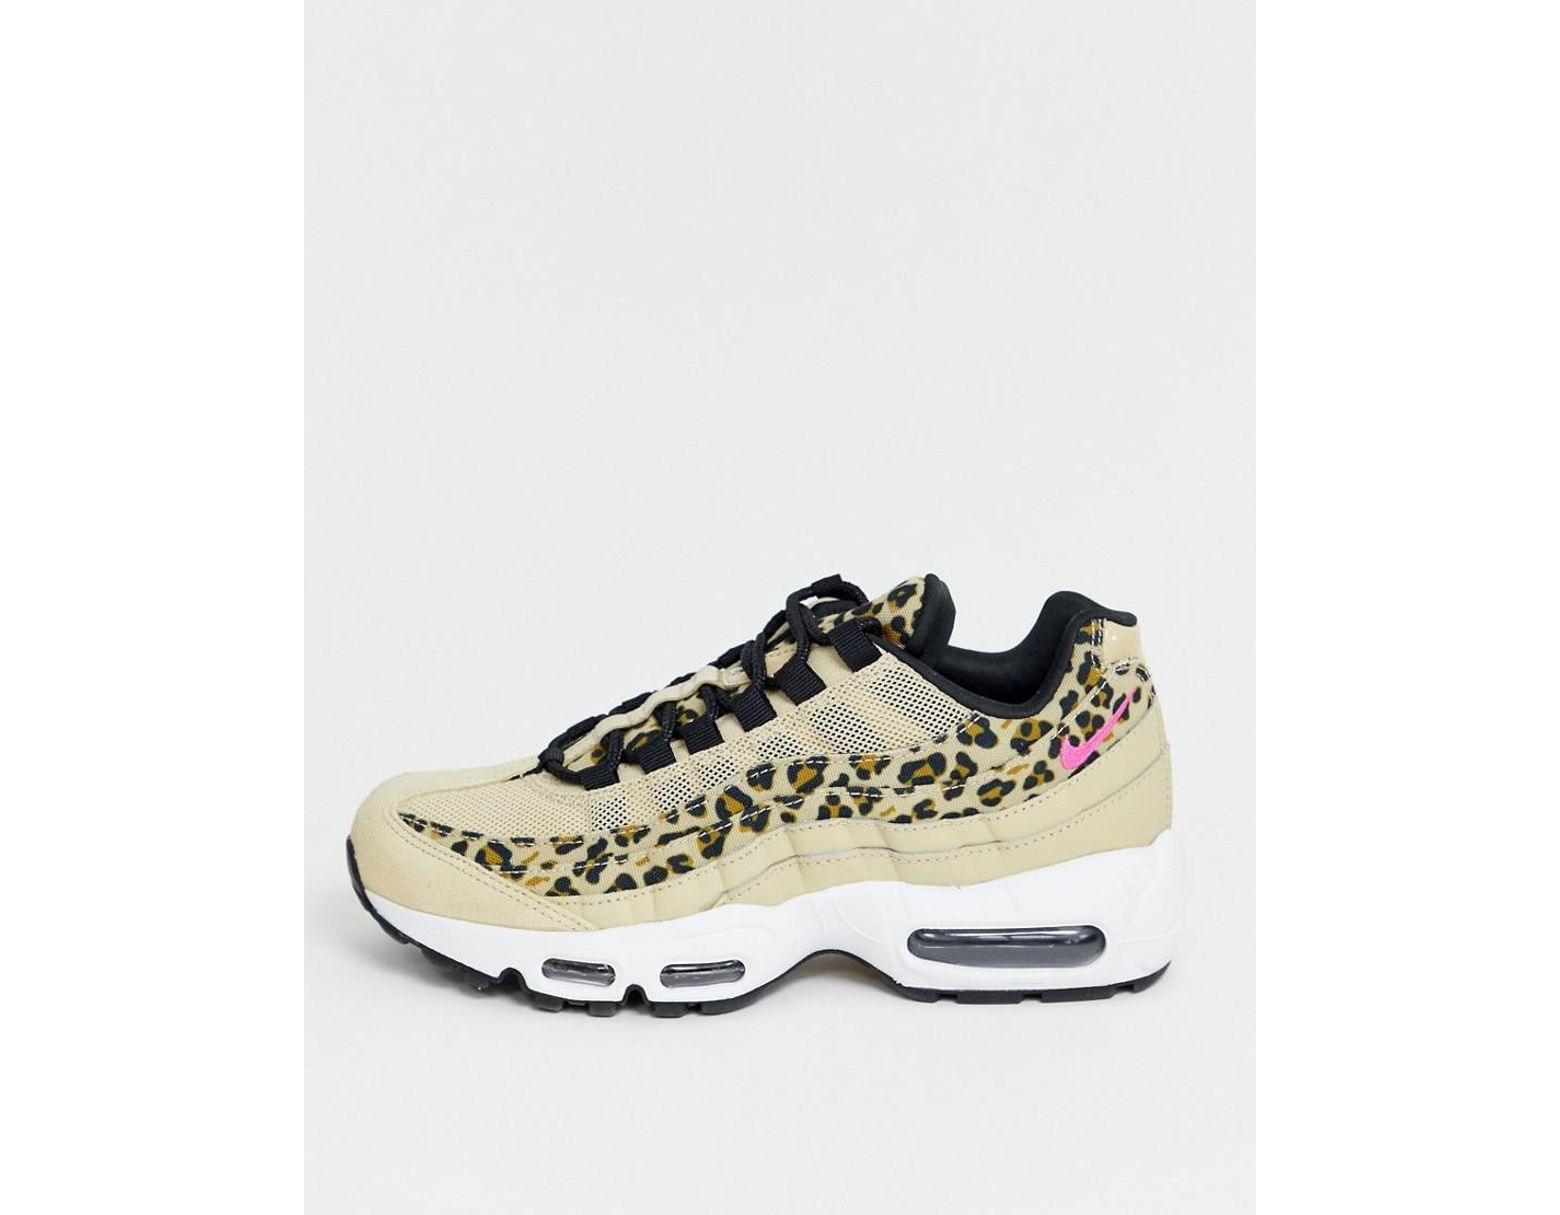 898d52ec0a94 Nike Leopard Print Air Max 95 Trainers - Lyst